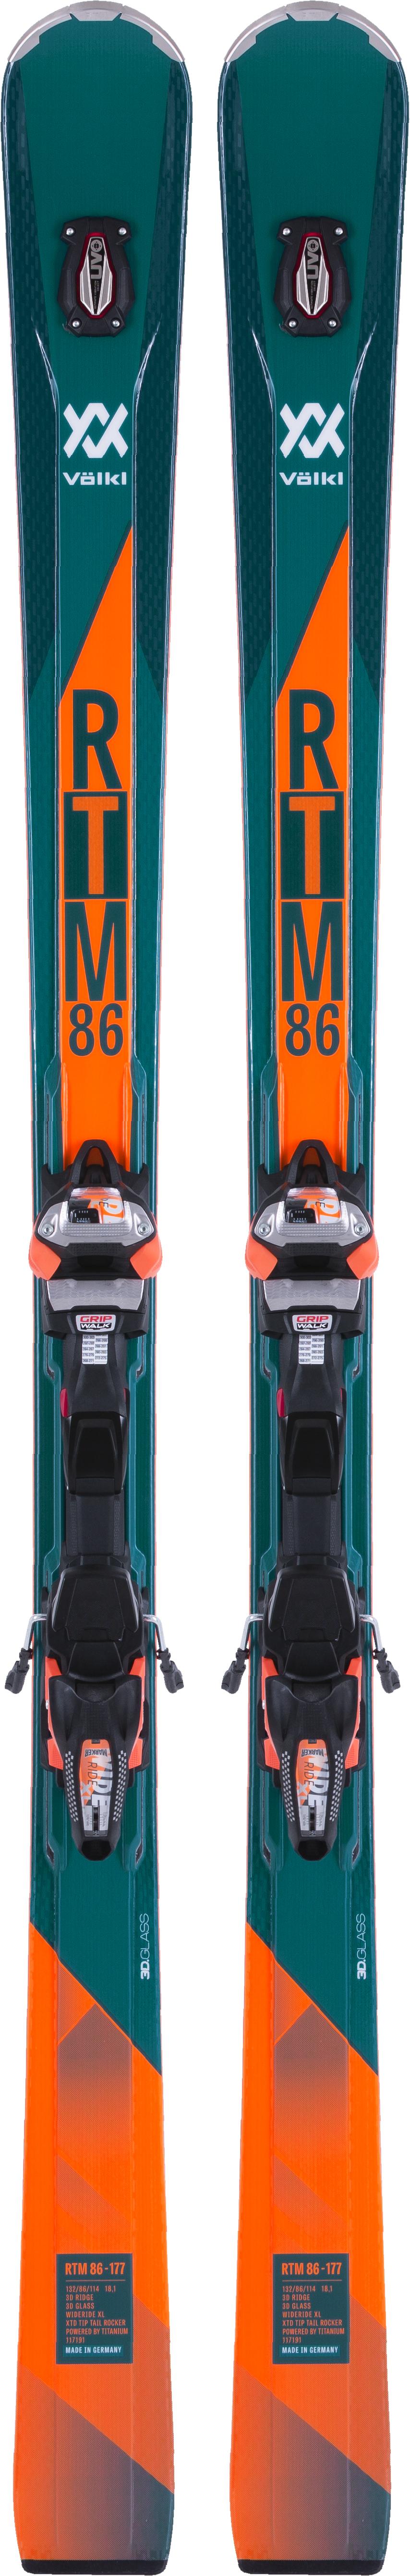 Volkl Горные лыжи Volkl RTM 86 + iPT WR XL 12 FR GW mikasa w6608w junior